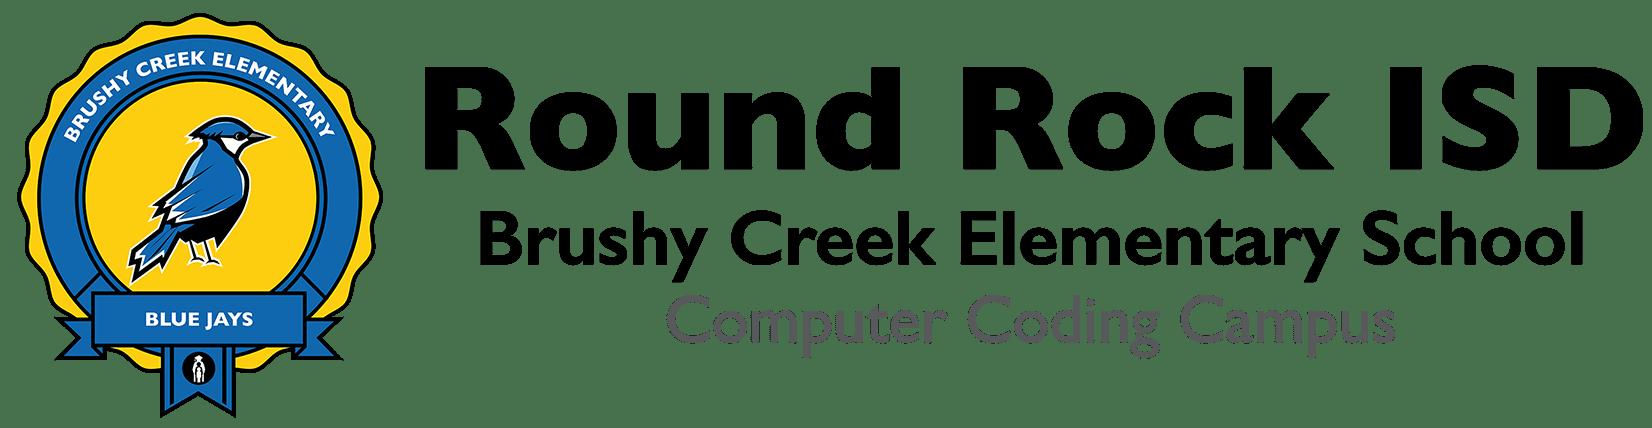 Brushy Creek Elementary School